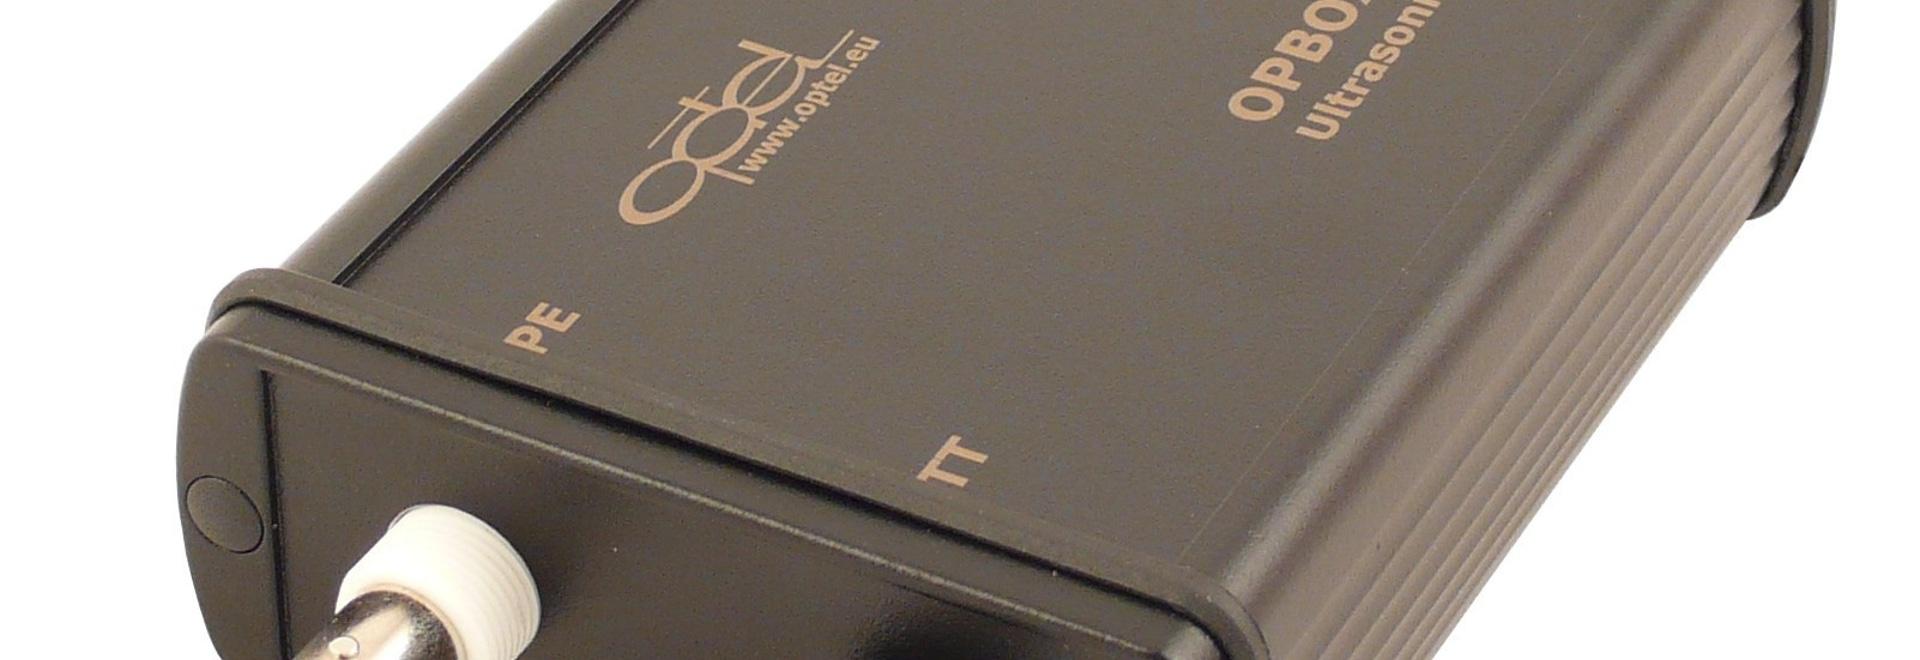 OPBOX ultrasonic NDT inspection device